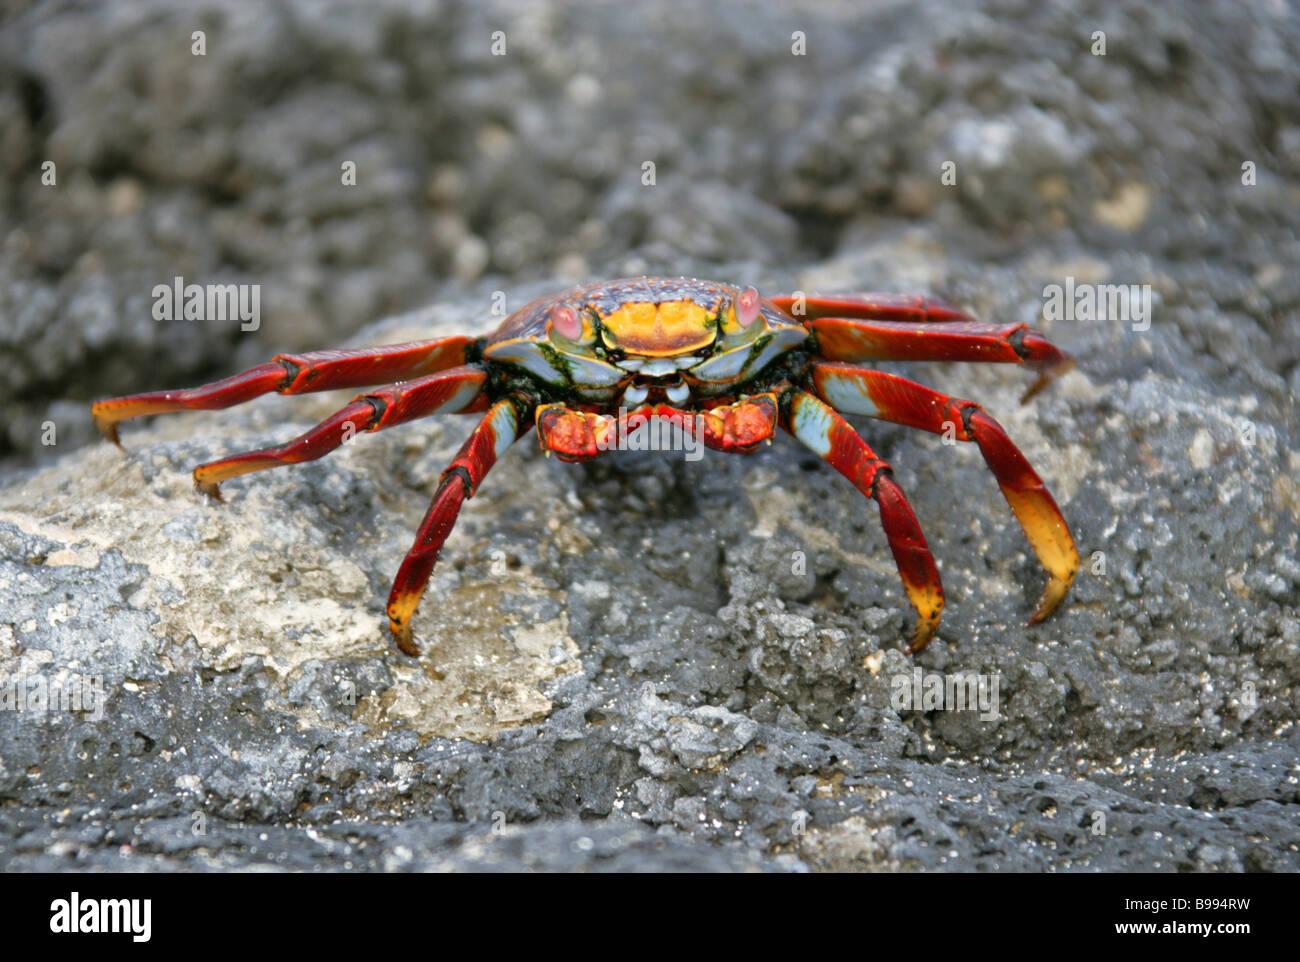 Sally Lightfoot Crab, Grapsus grapsus, San Cristobal Island, Galapagos Islands, Ecuador, South America - Stock Image